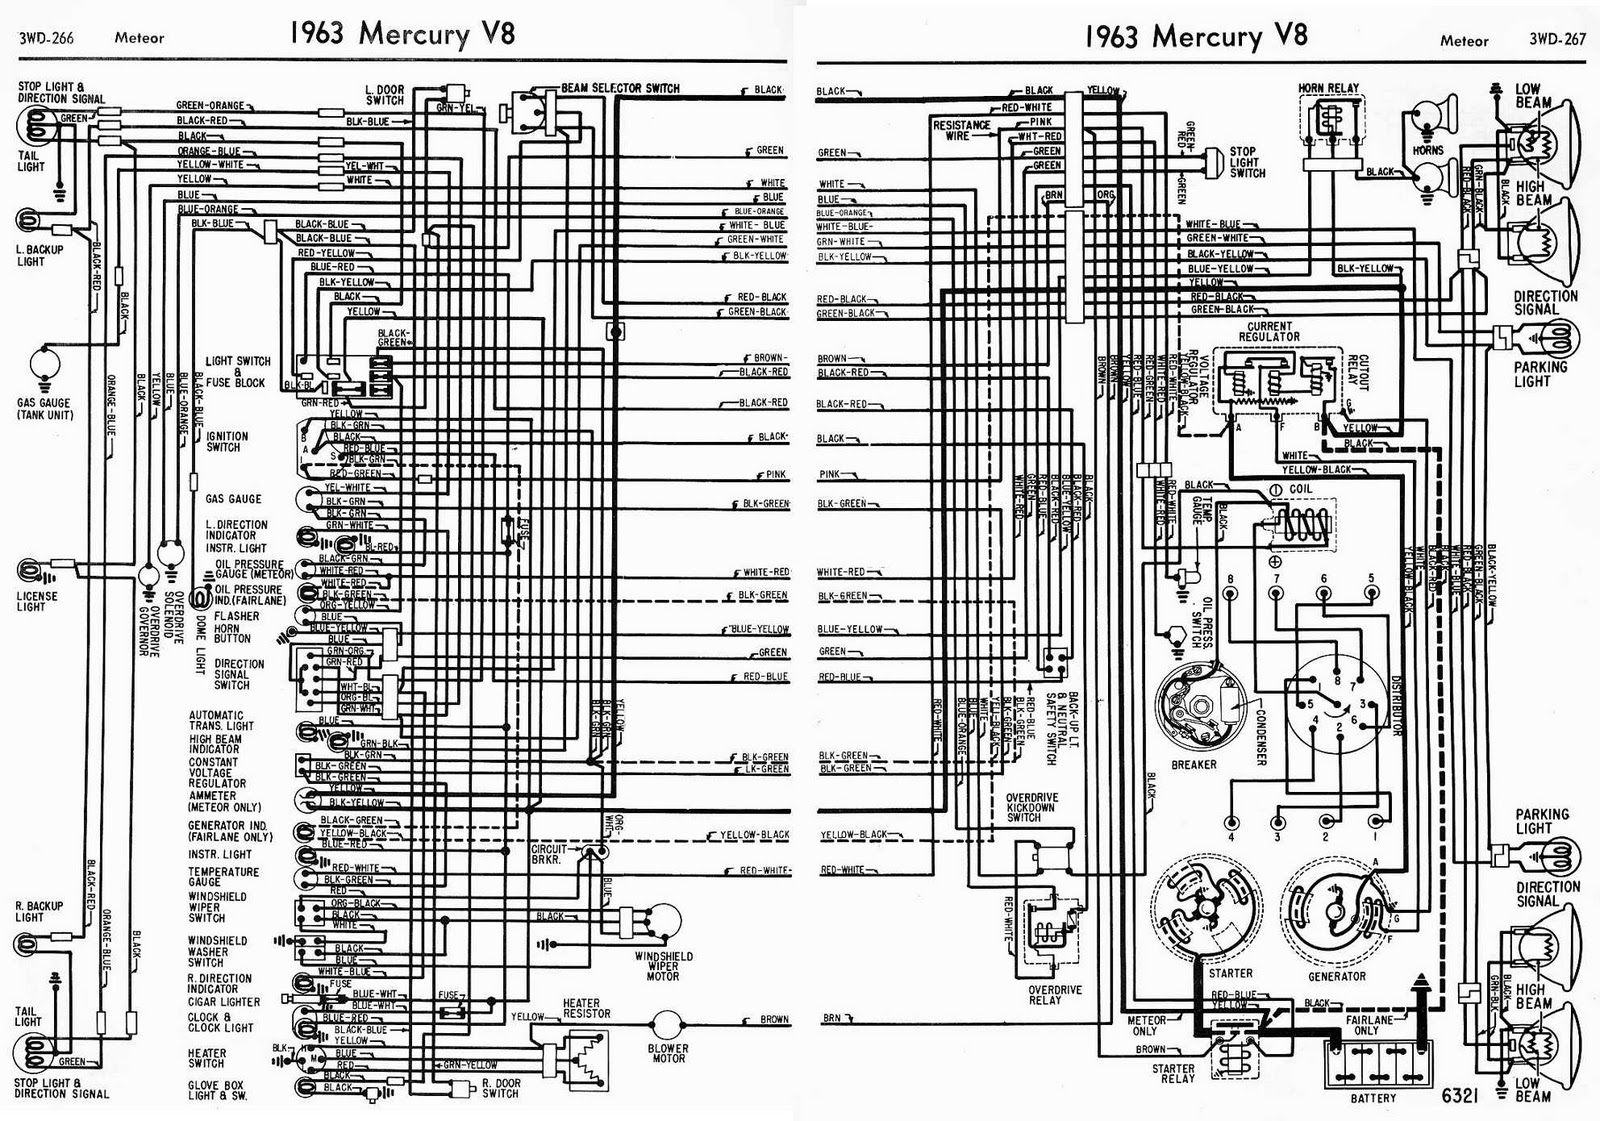 92 Polaris Snowmobile Wiring Diagram Detailed Diagrams Trail Boss 250 Trusted 2017 Snowmobiles